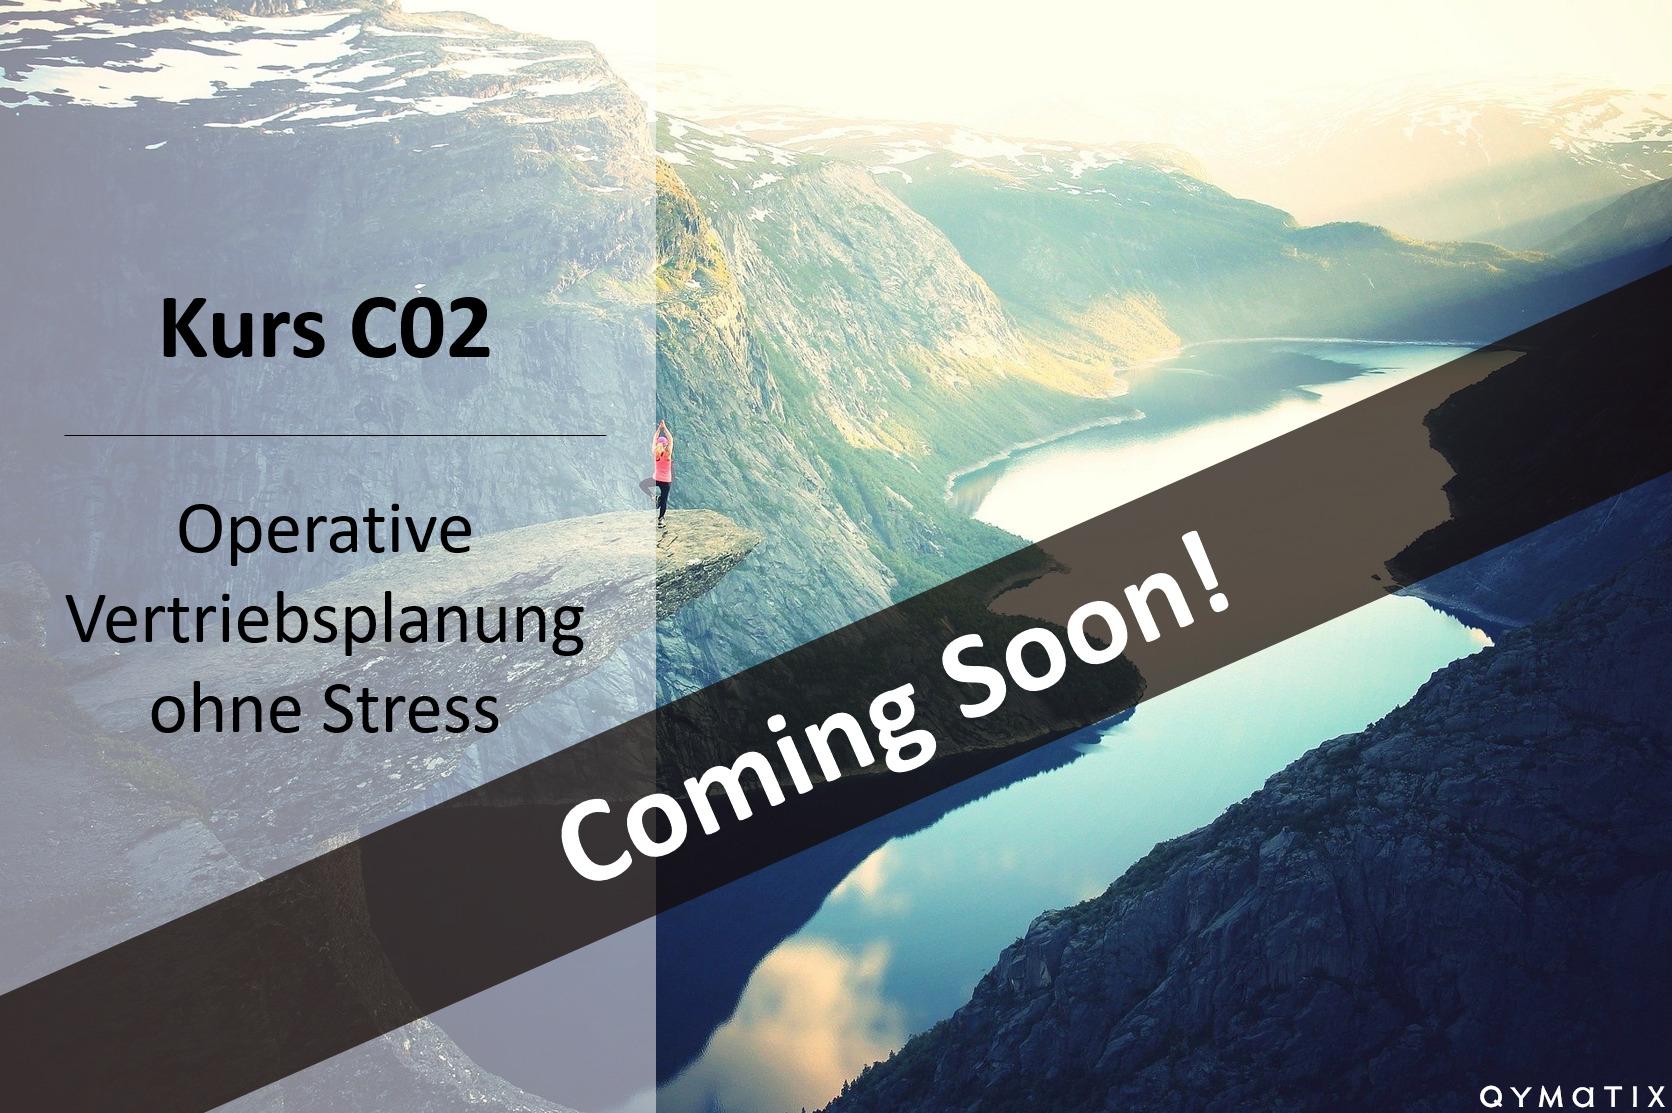 Operative Vertriebsplanung ohne Stress – C02